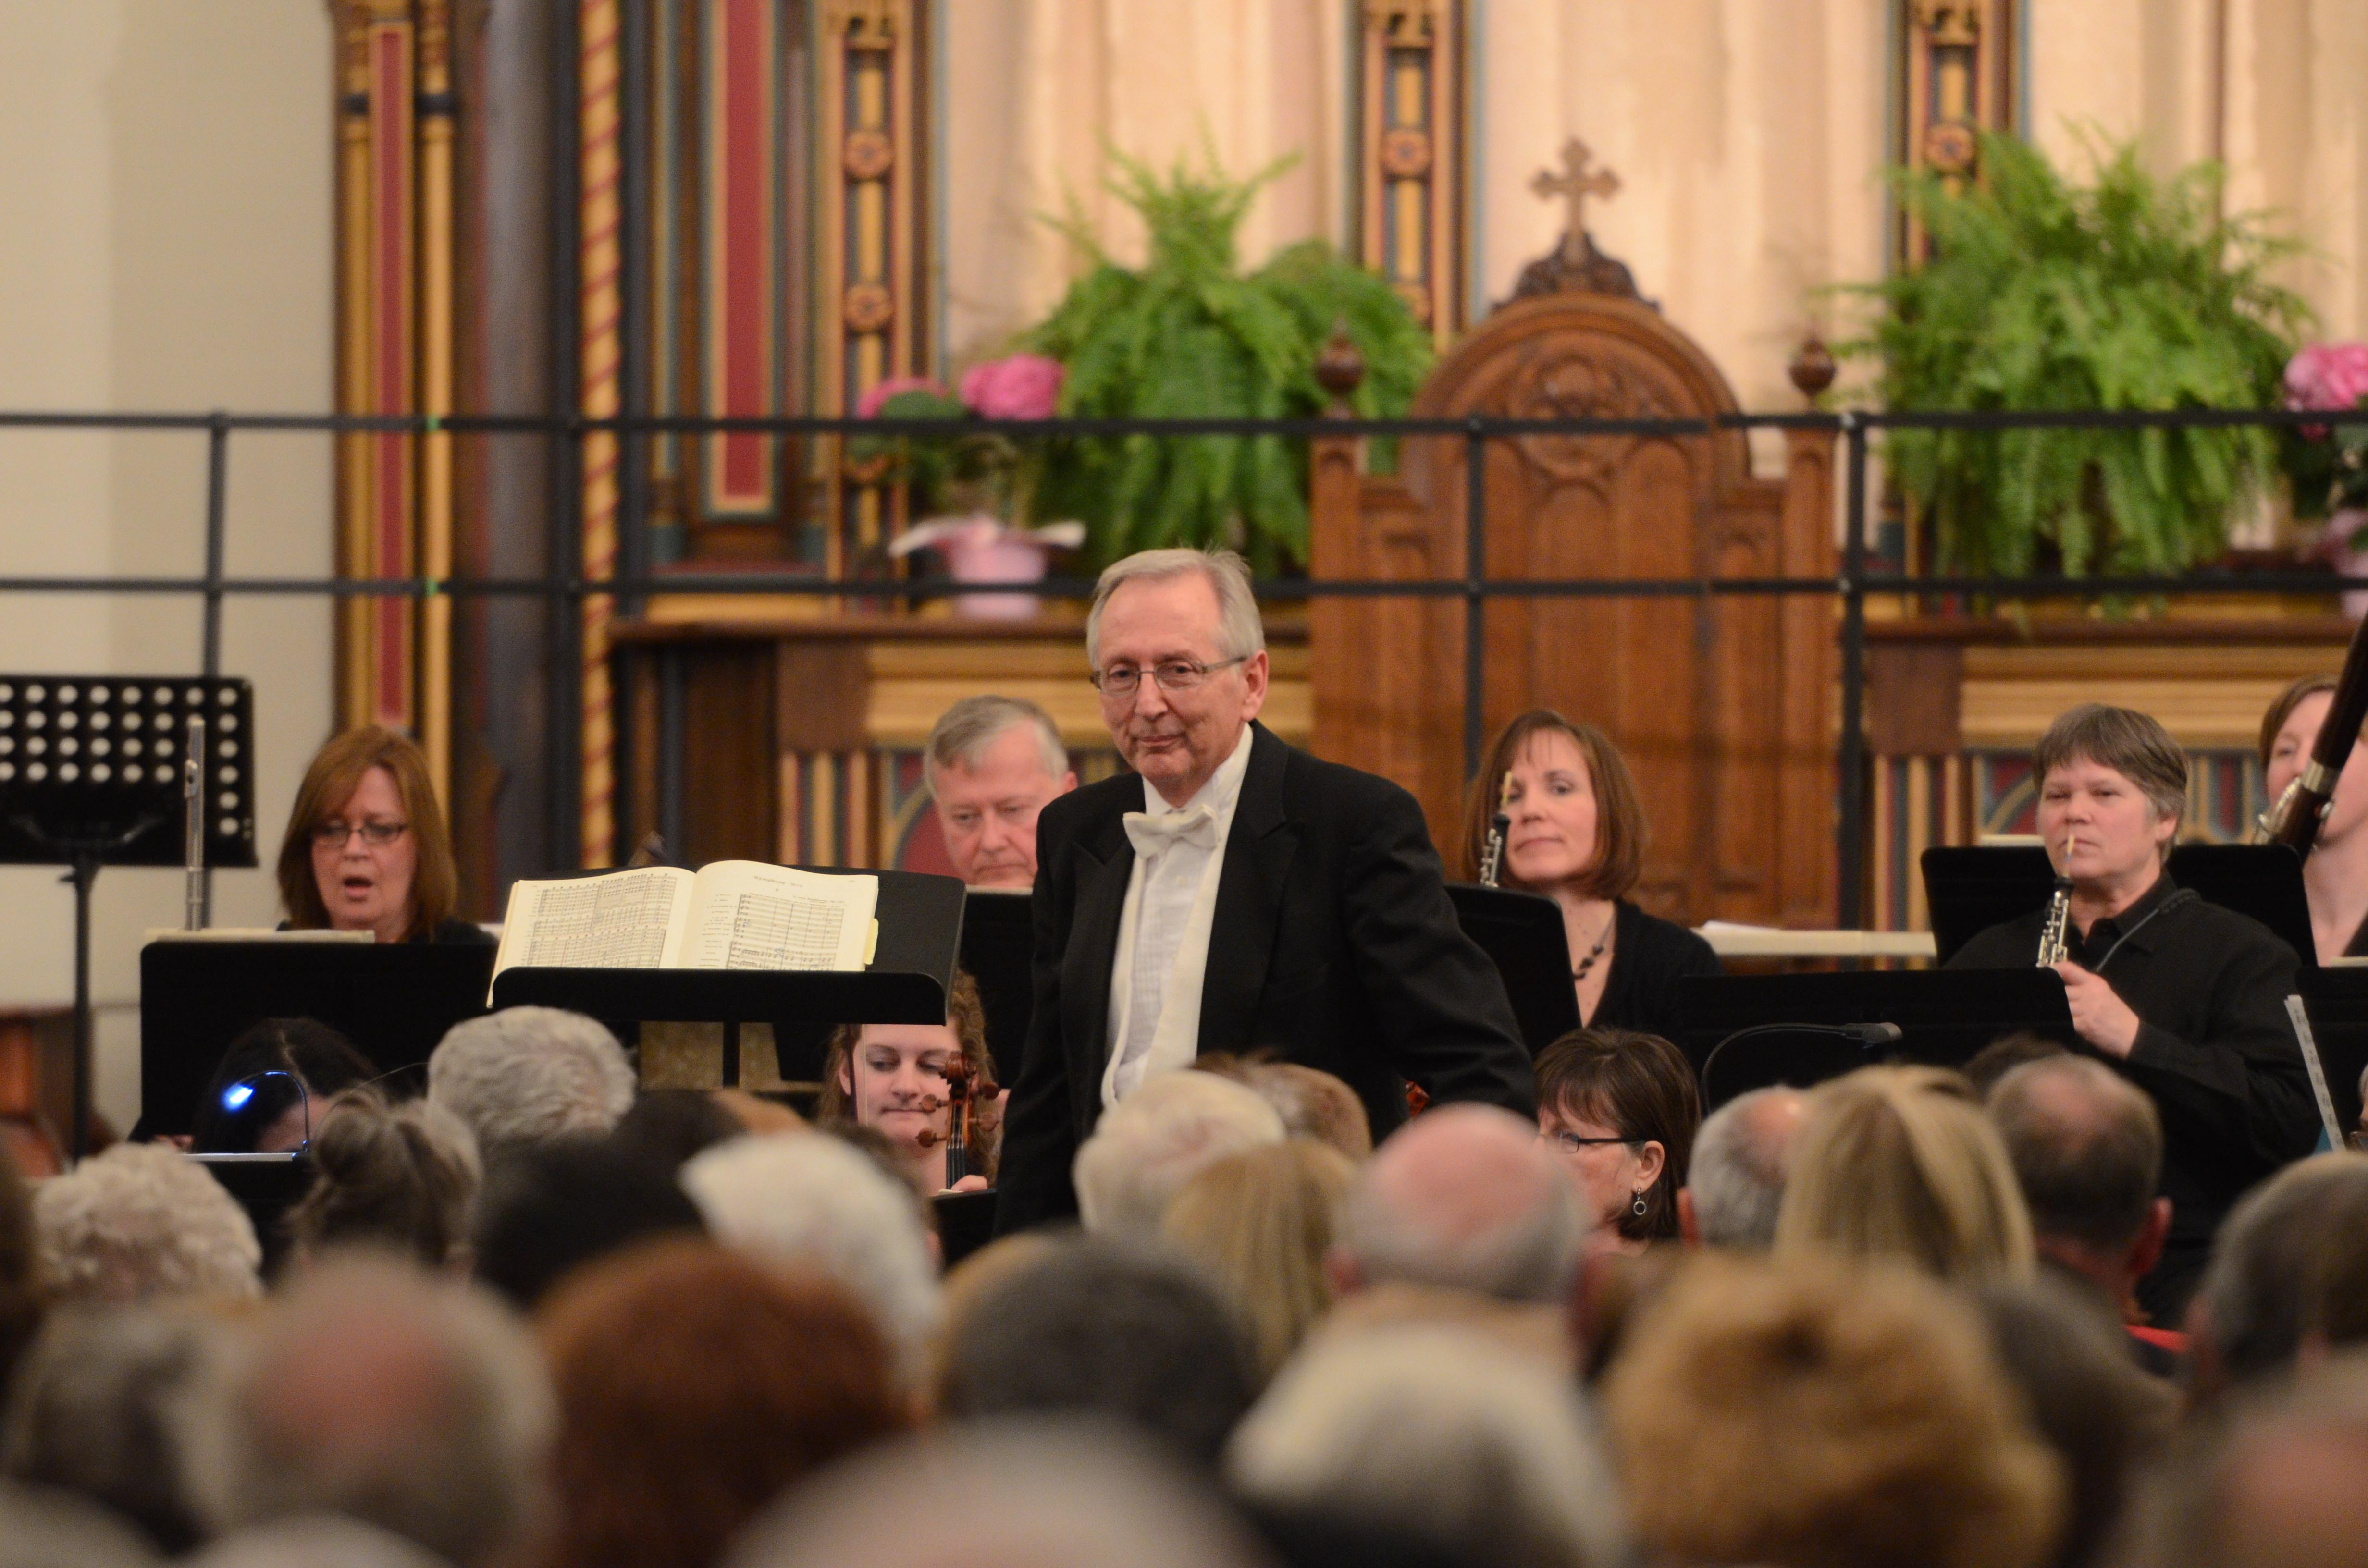 John Wilkinson, conductor